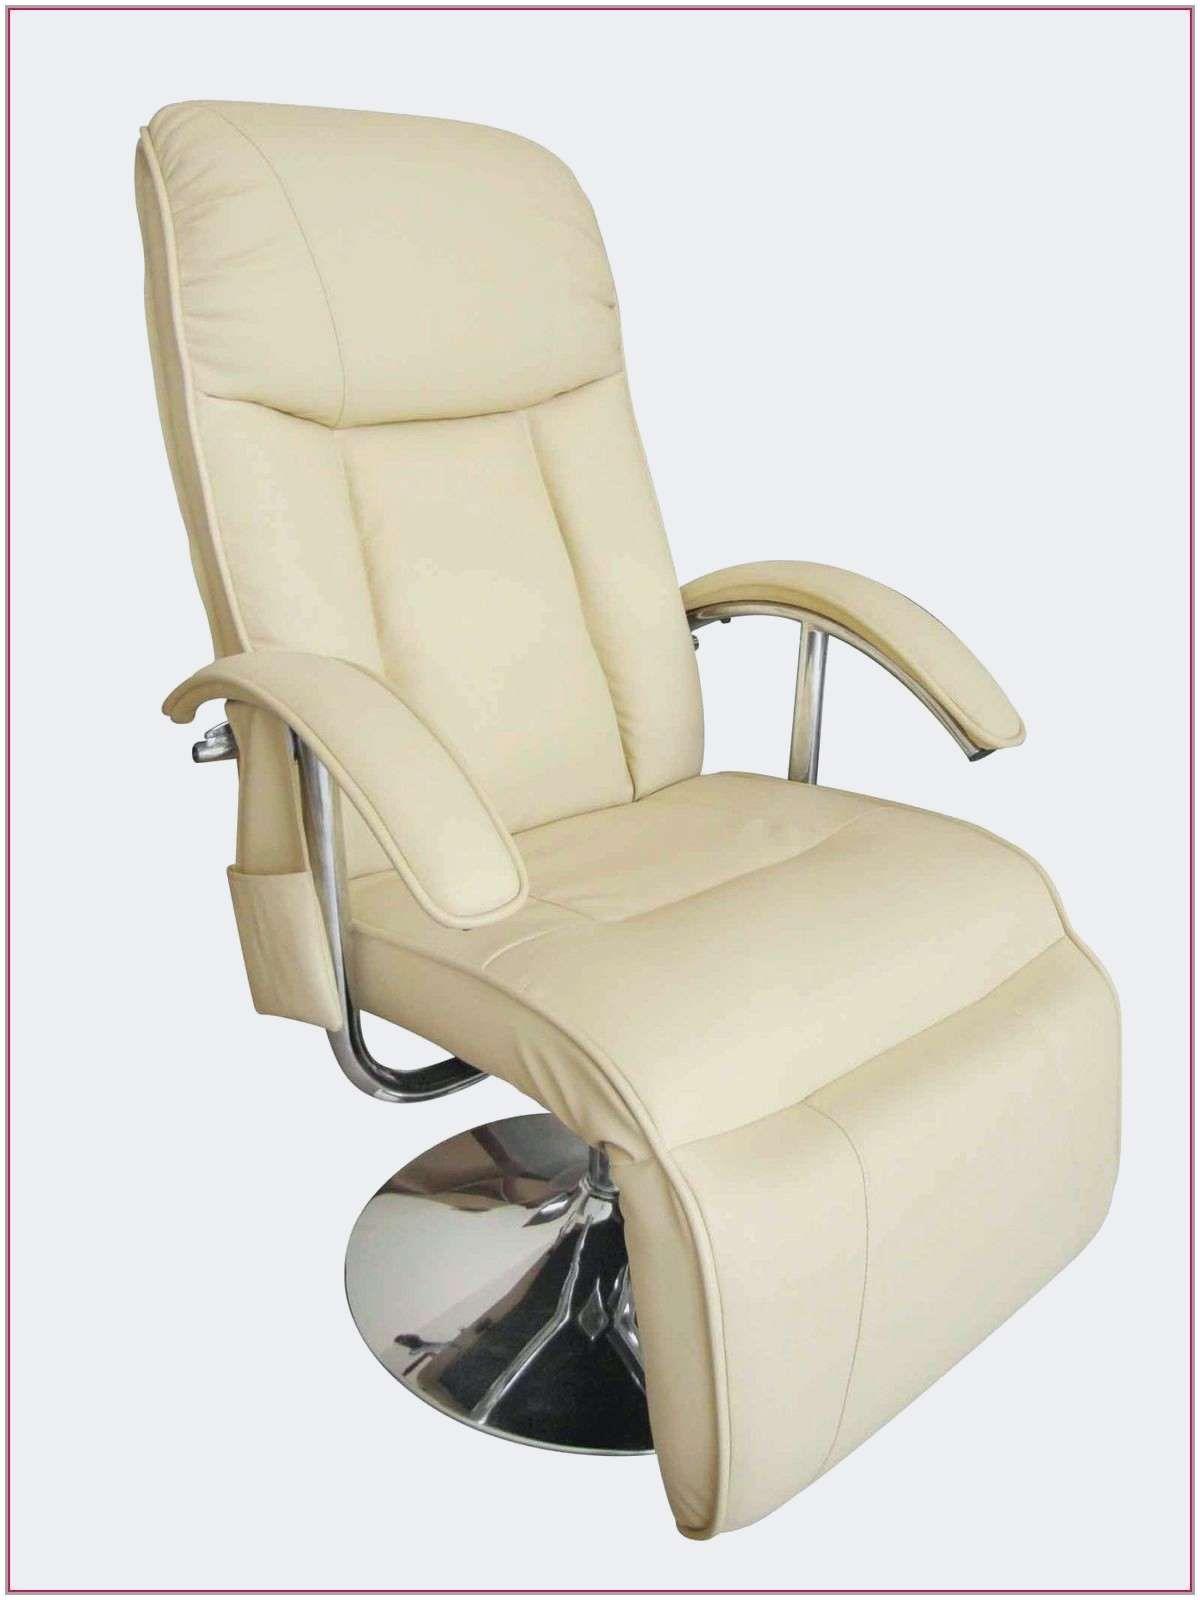 16 Unique Fauteuil Relax Conforama Pas Cher Pics Massage Chair Electric Massage Chair Leather Chair